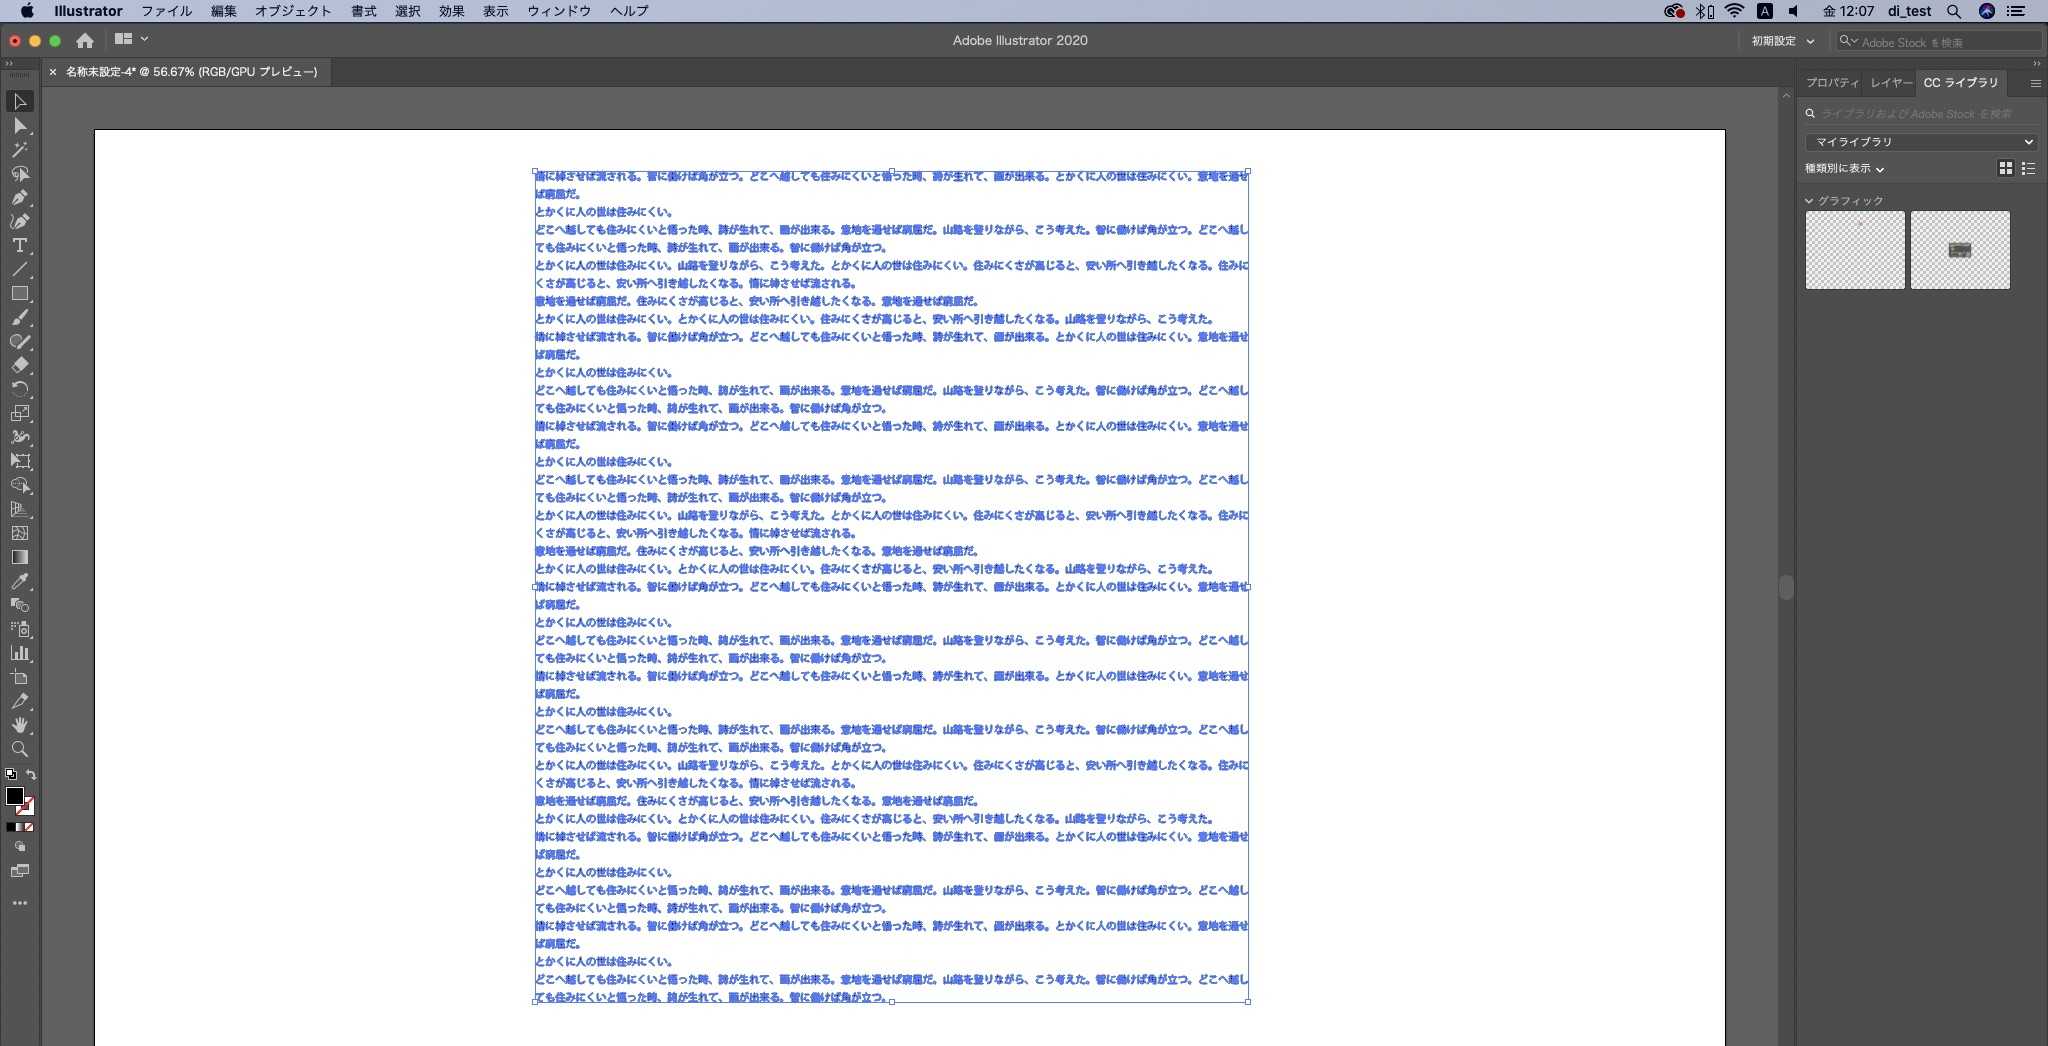 81E00AC5-295B-4F8A-99CB-F7D14B22A5D4_1_201_a